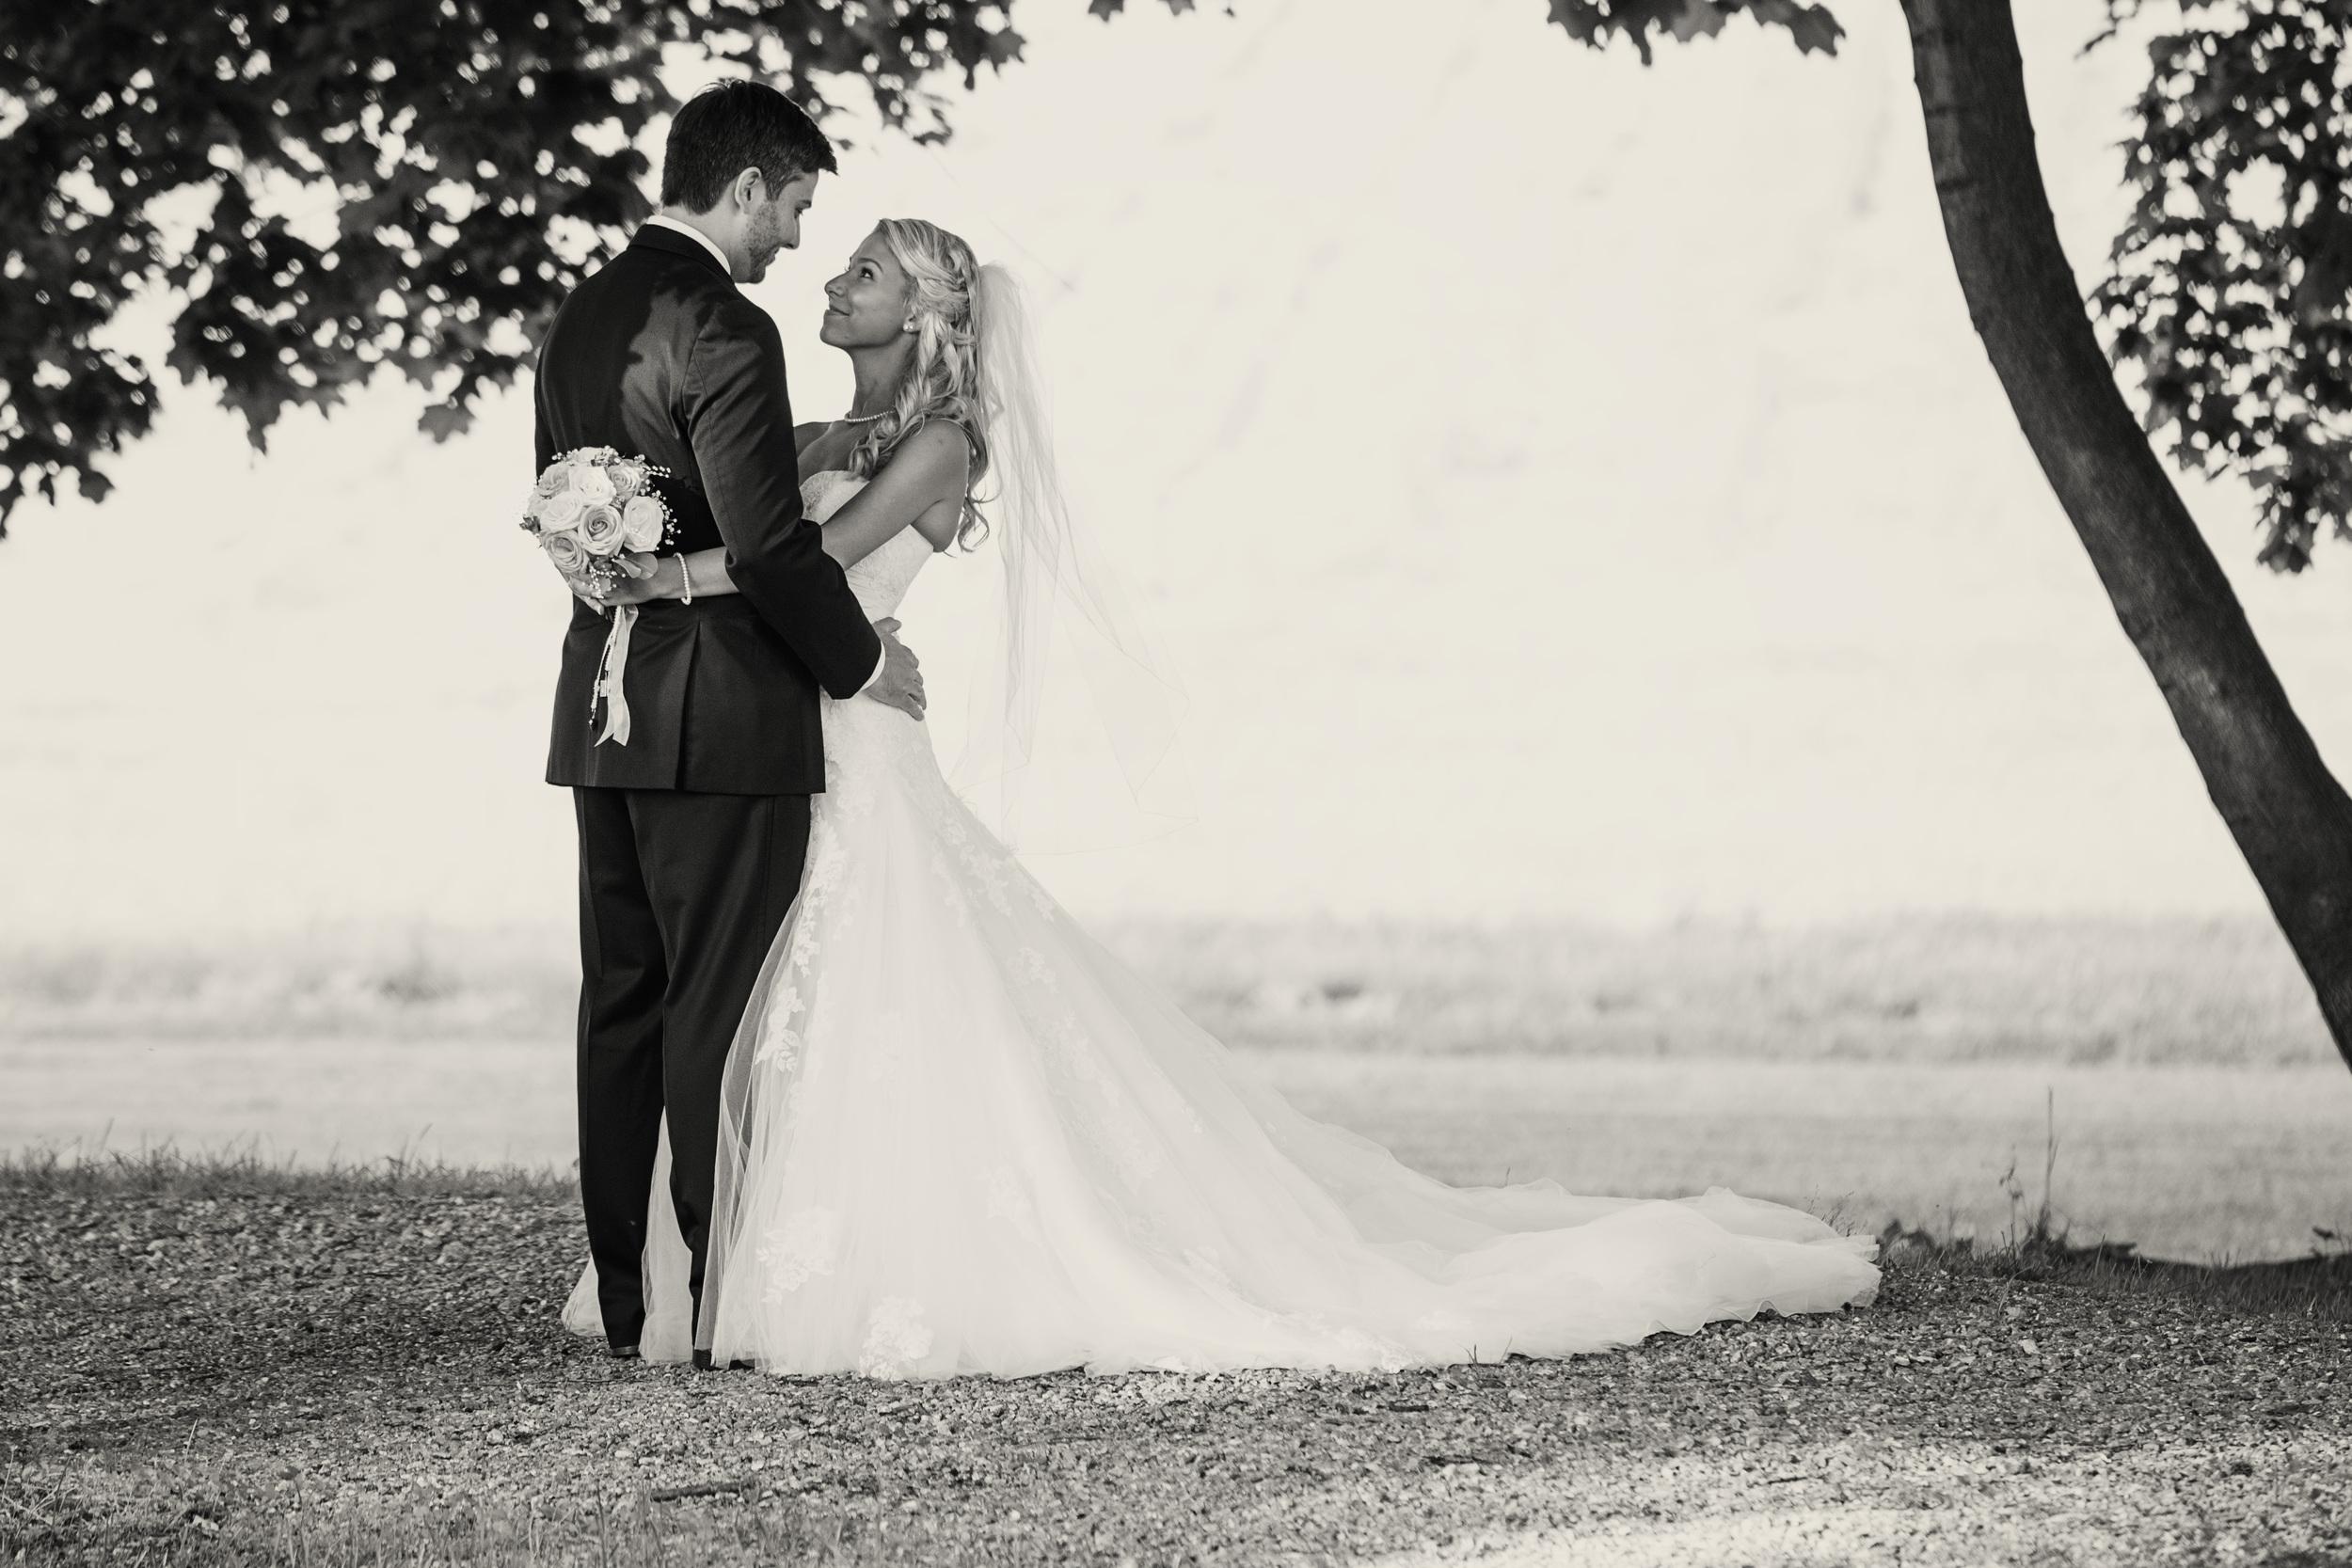 peach_plantation_spring_wedding_lynchburg_va034.jpg